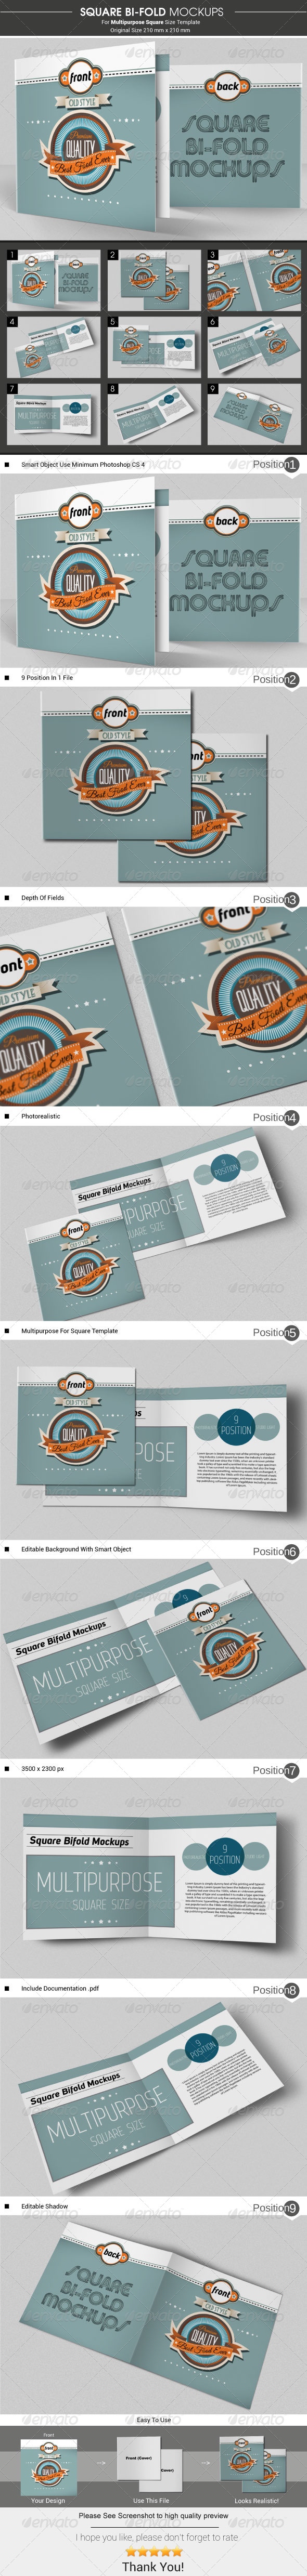 GraphicRiver Square Bi-Fold Brochure Mockups 6497042